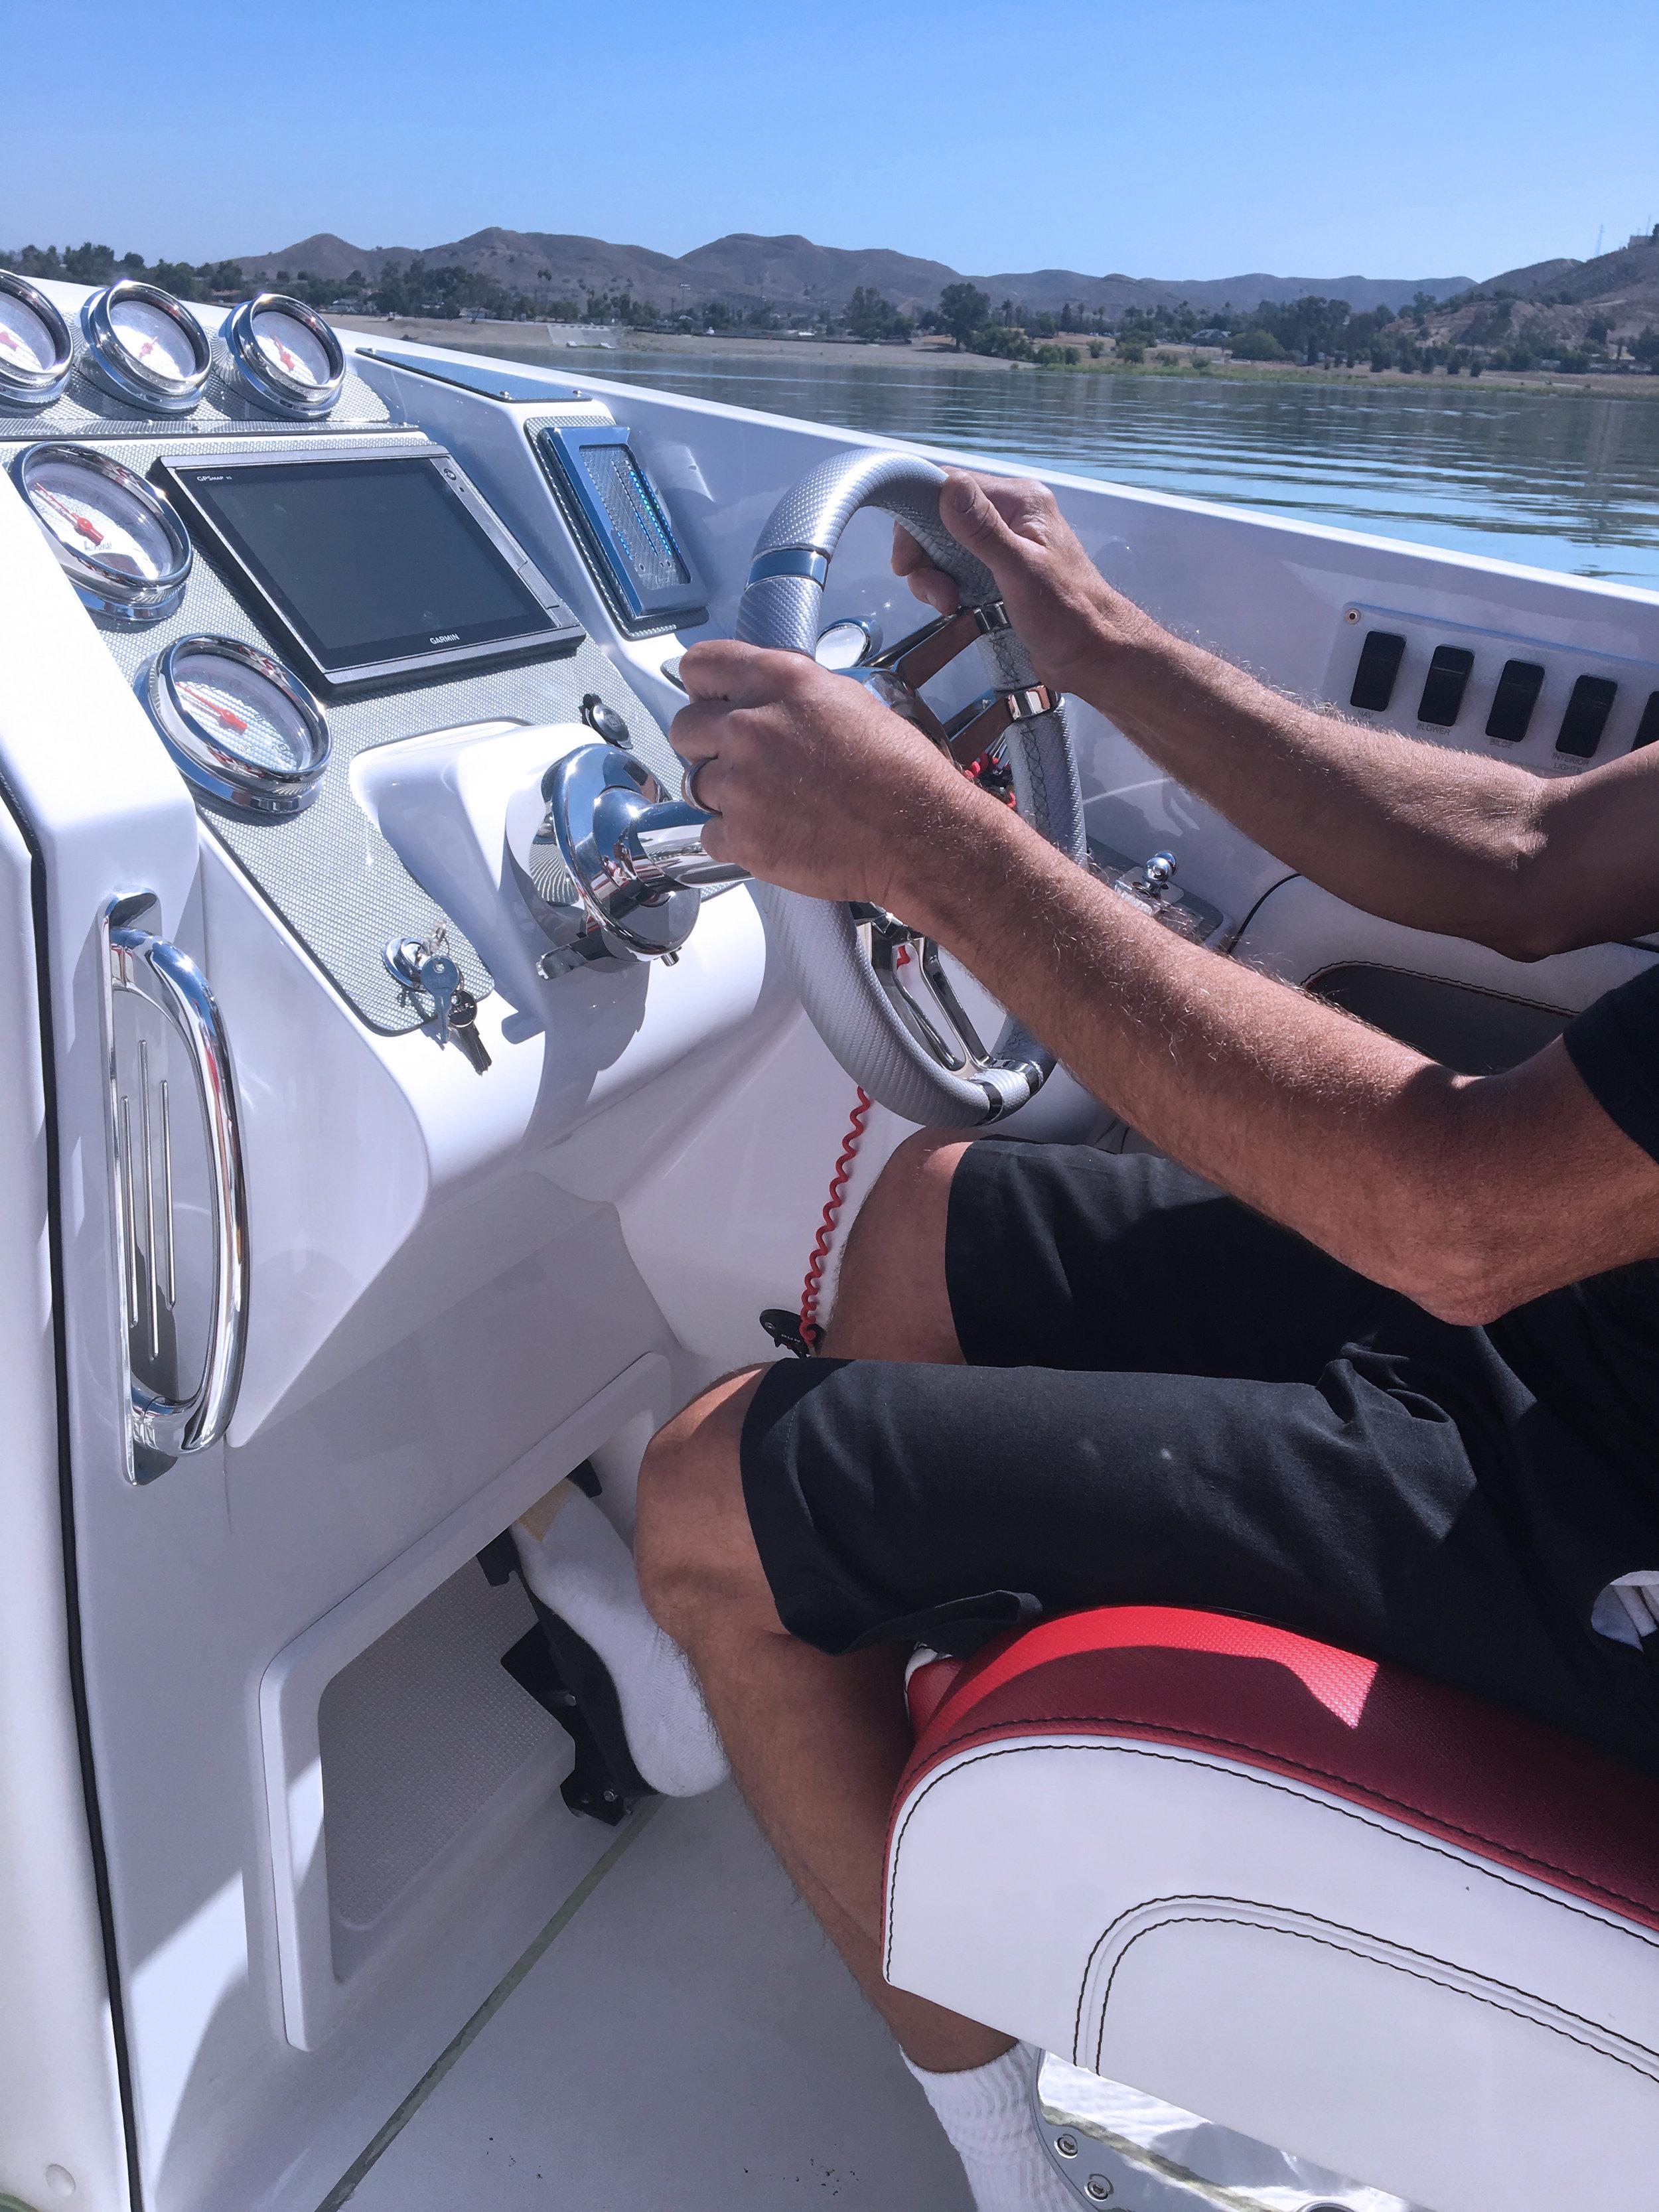 Lavey Craft 29 NuEra foot throttle June 2018.jpg